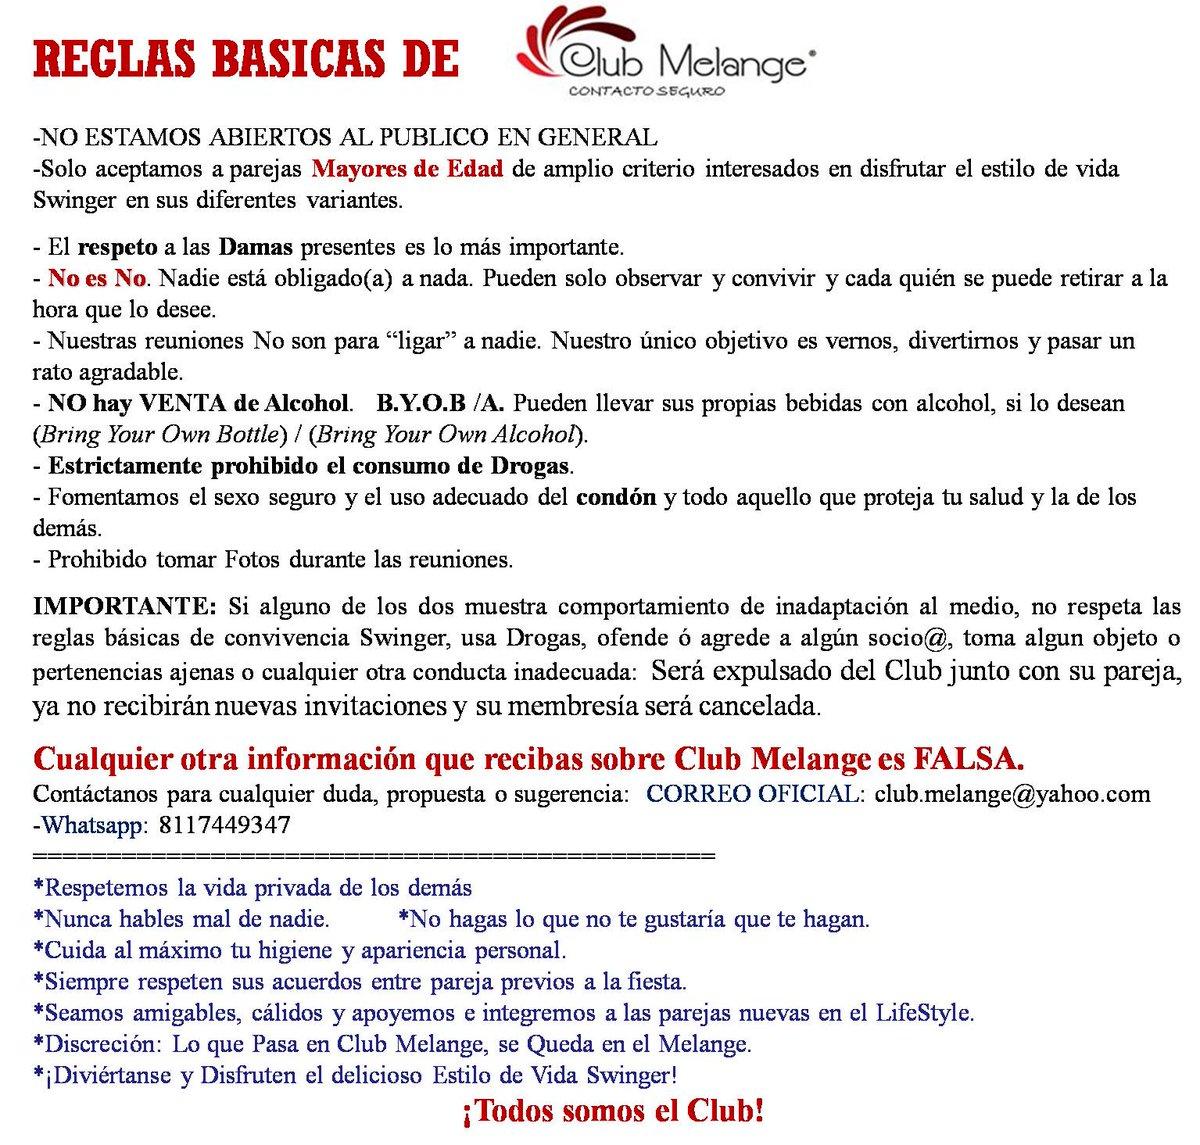 Club Melange (@ClubMelange): http://t.co/8Cb0OYbVMm